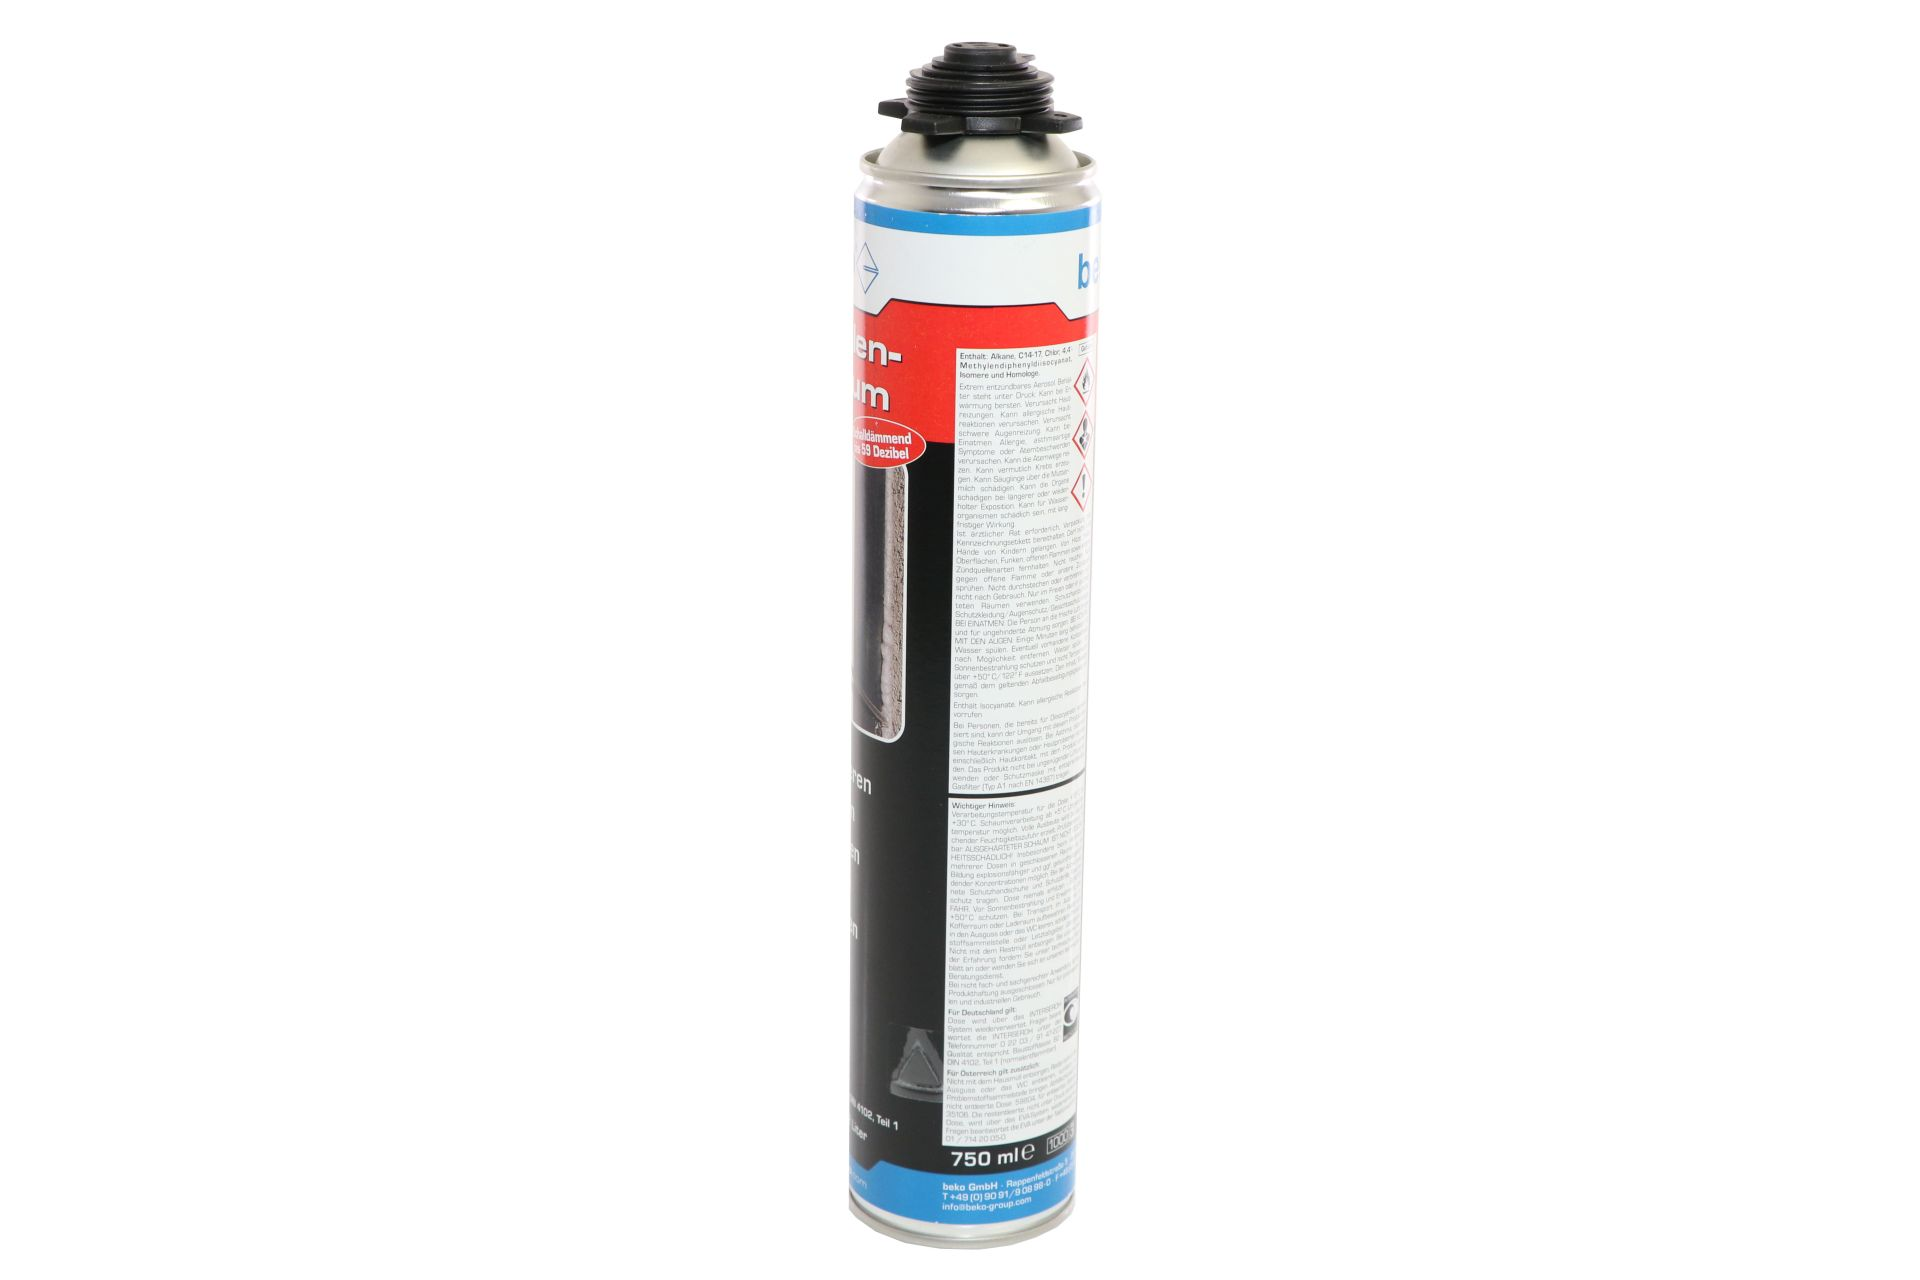 beko 1-Komponenten Polyurethan-Pistolenschaum, B2-Qualität, Ausbeute ca. 42 l, 750 ml Dose